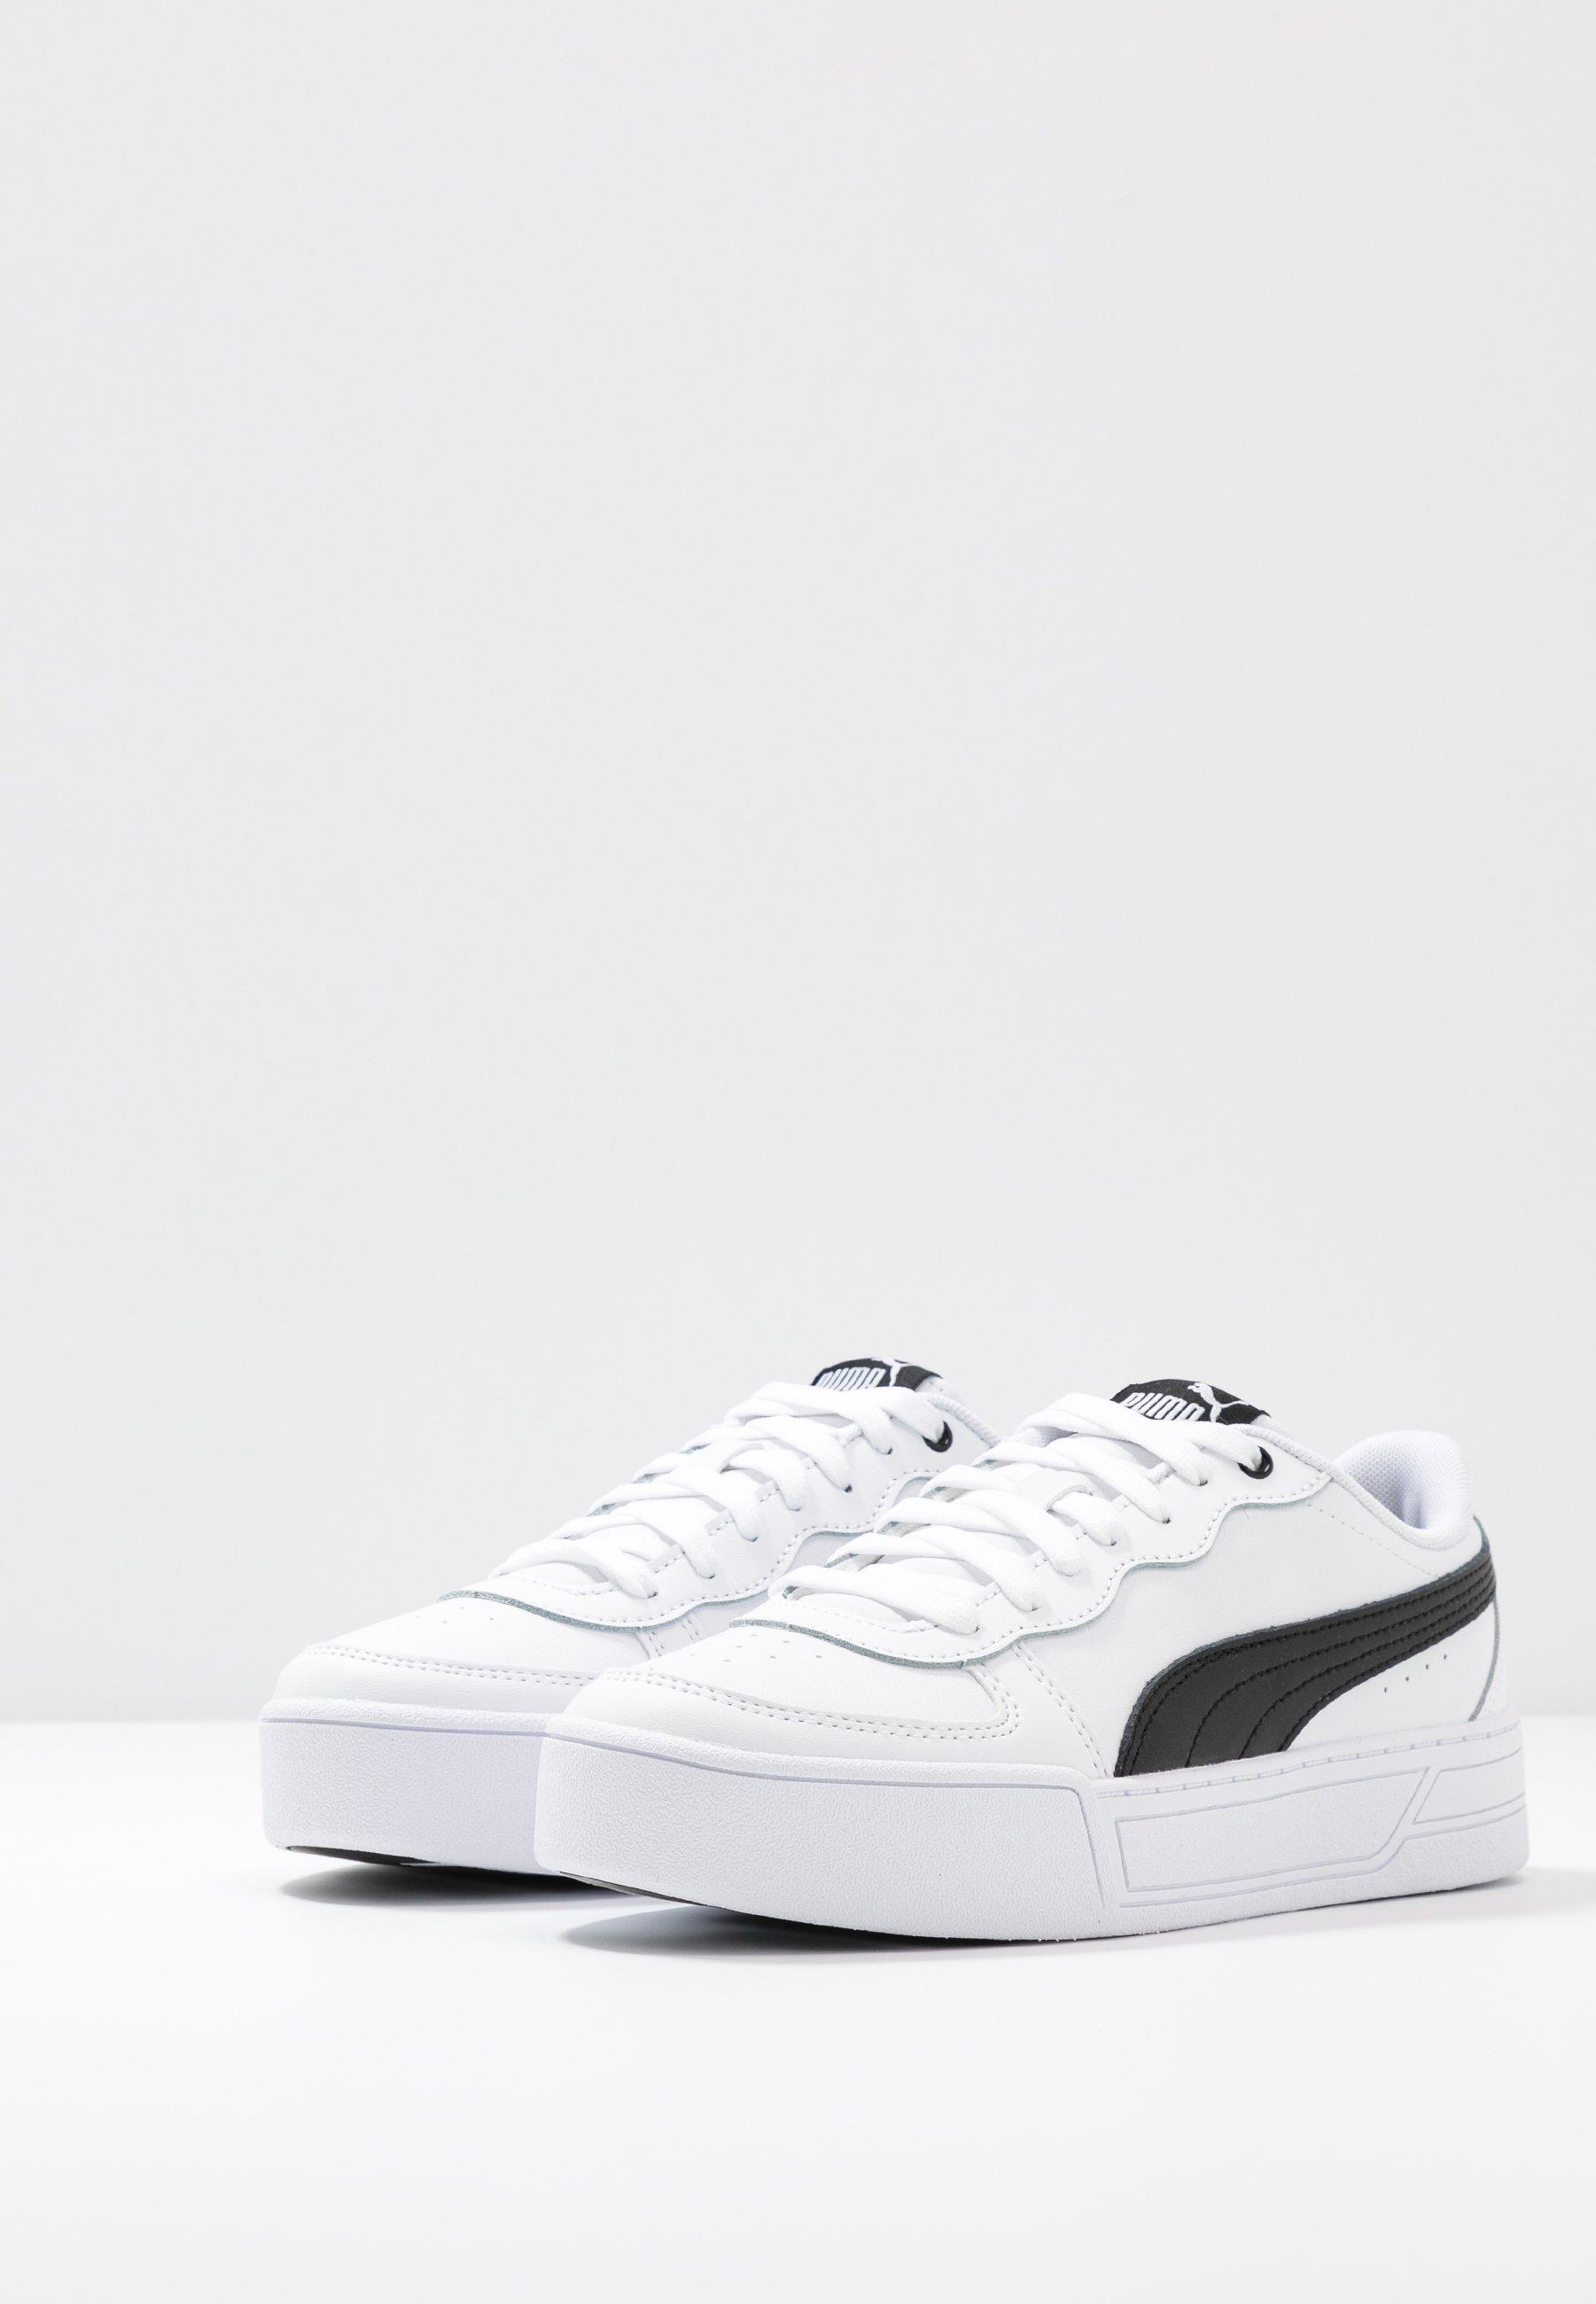 Puma BASKET CLASSIC Sneakers laag whiteblack Zalando.nl